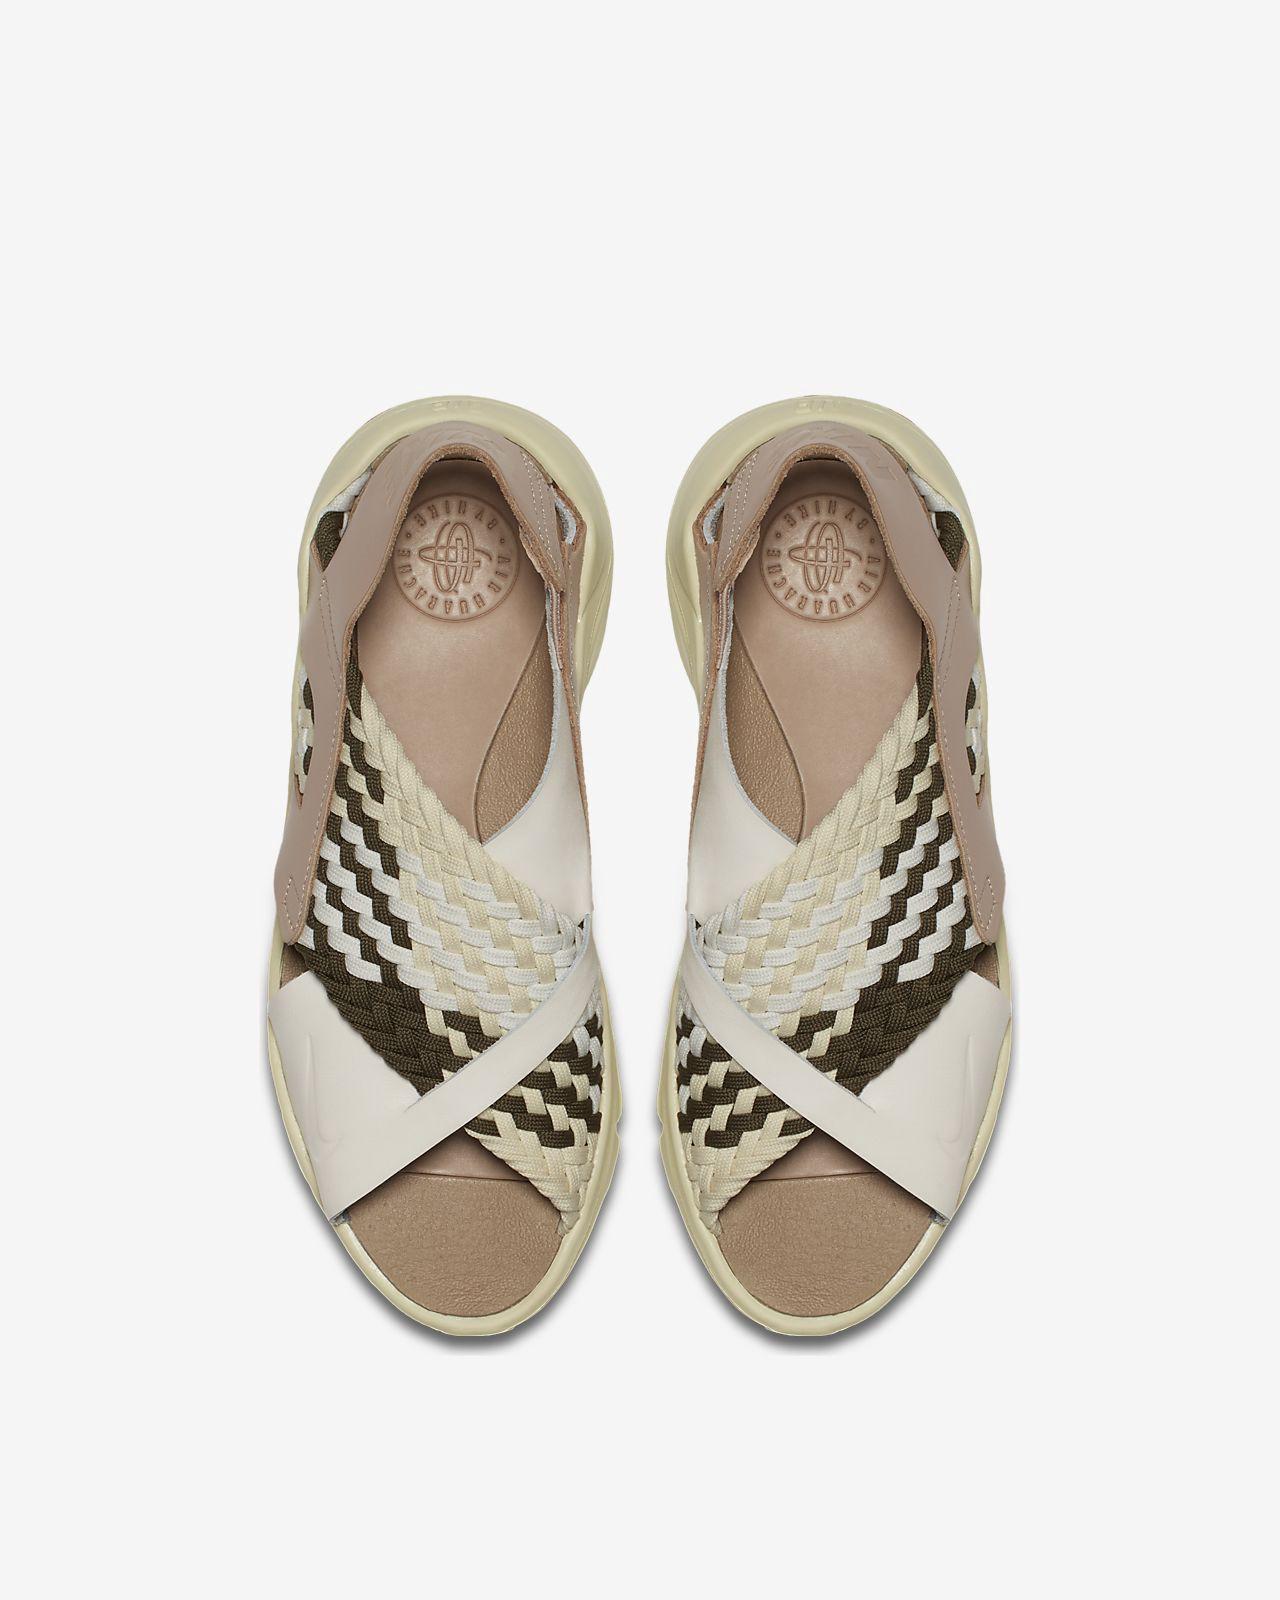 308903f229ea1 Nike Air Huarache Ultra Women s Sandal - 5